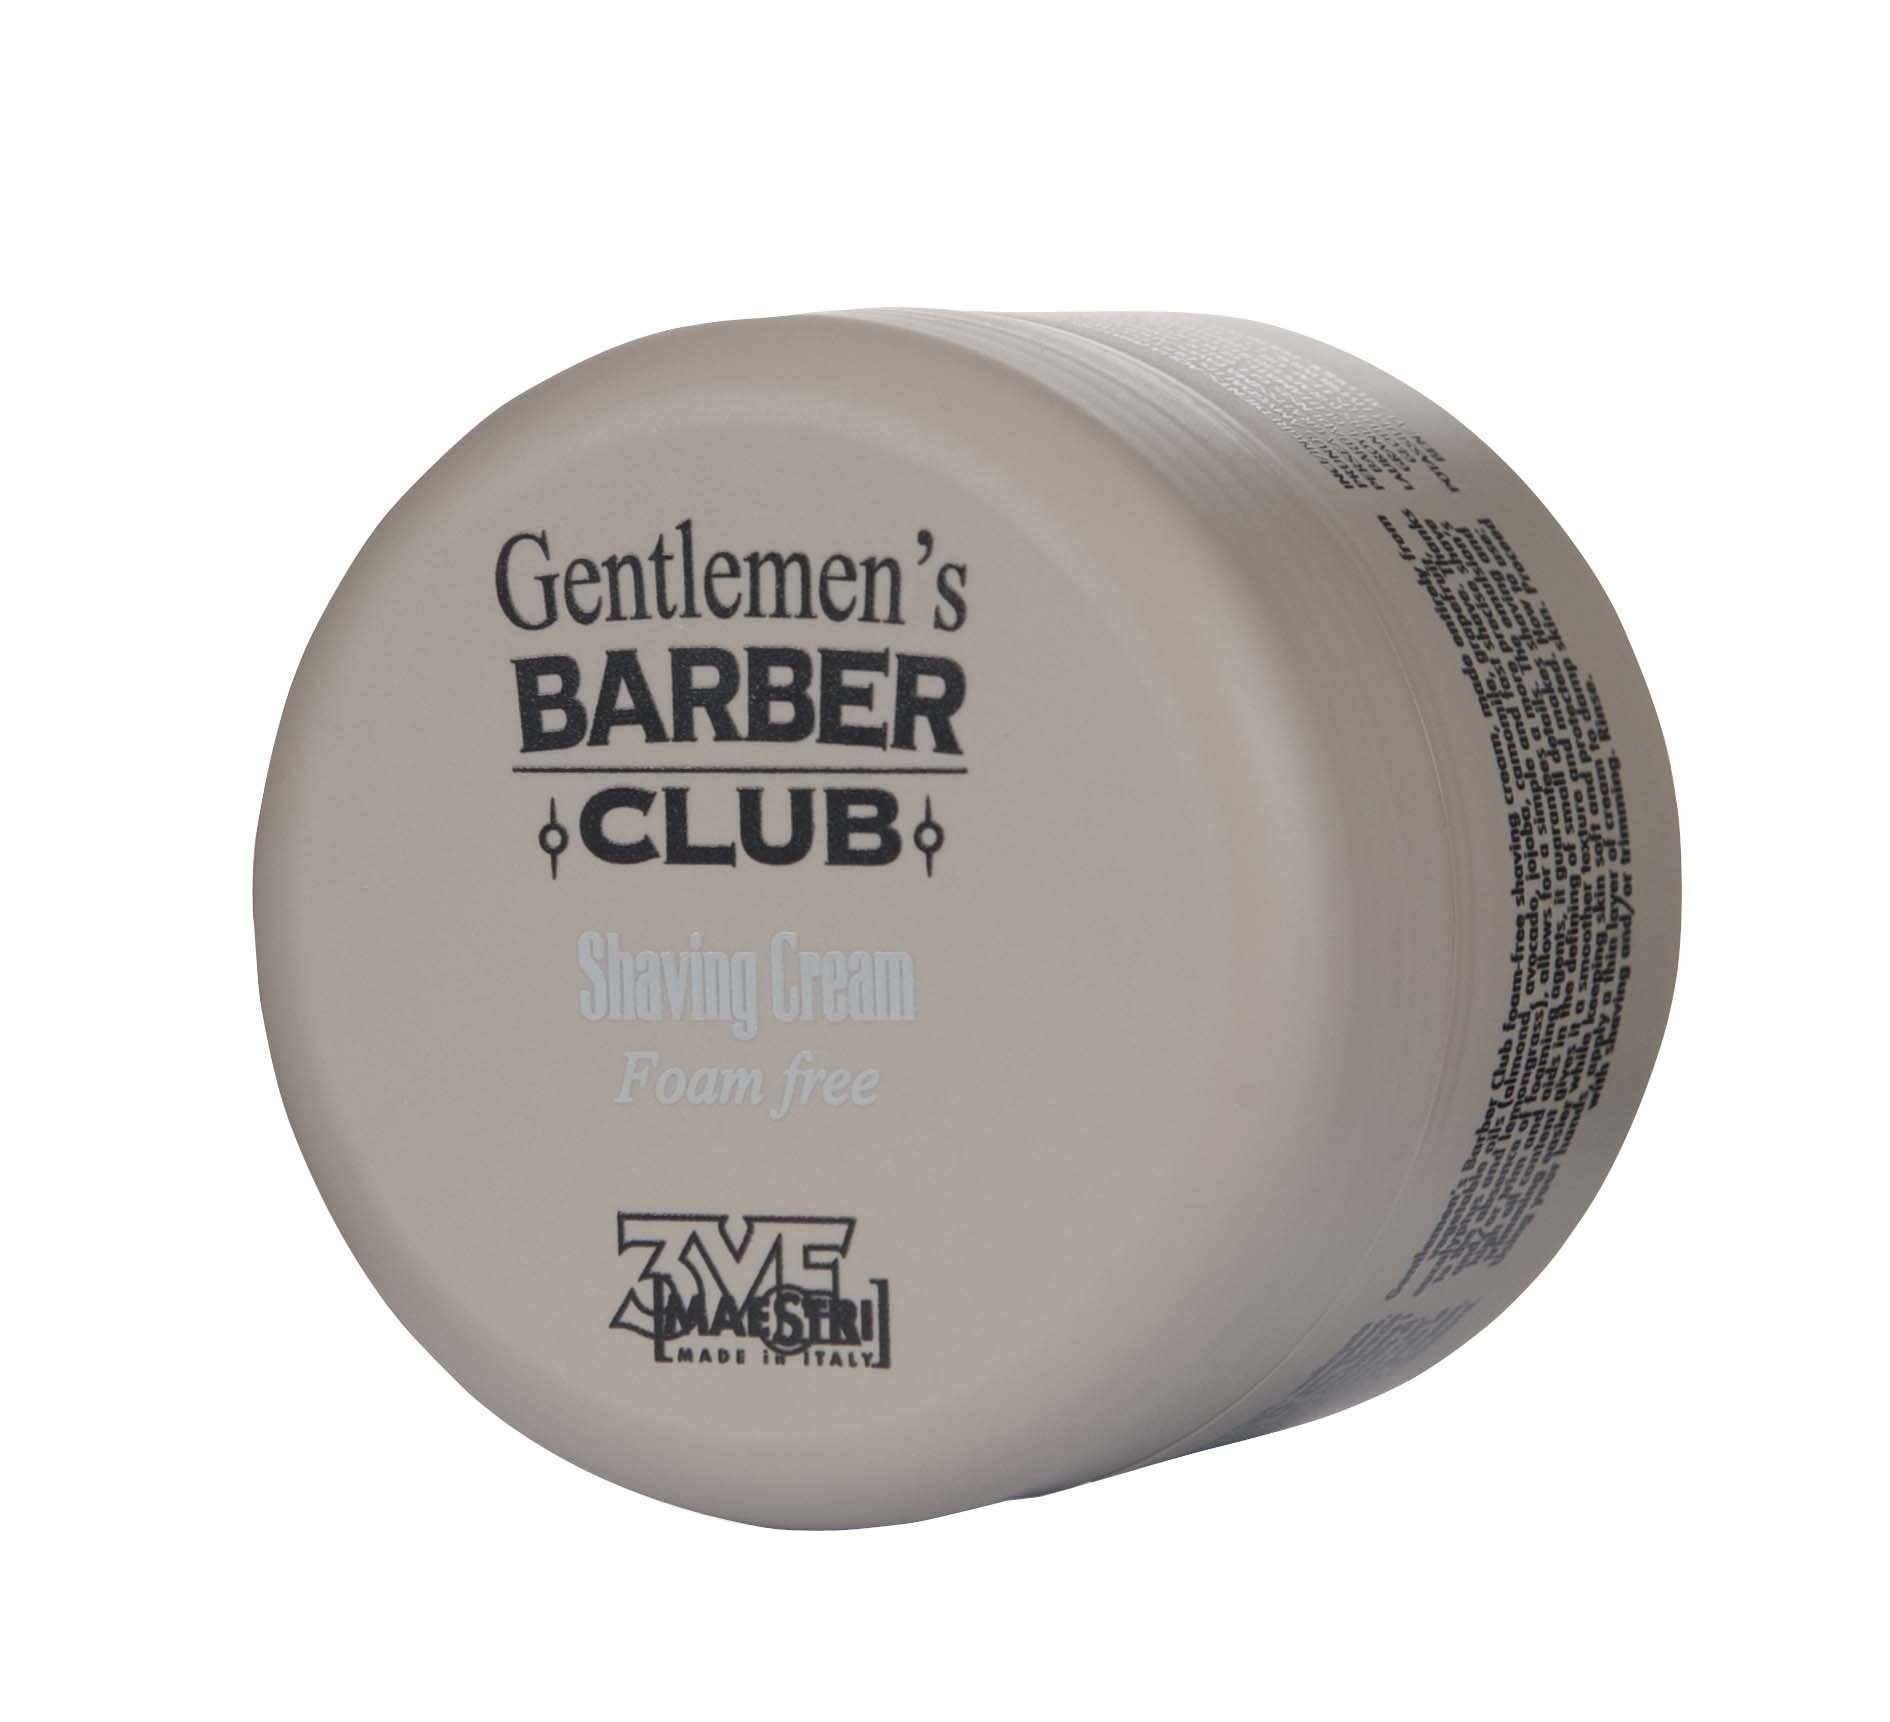 BARBER CLUB SHAVING CREAM